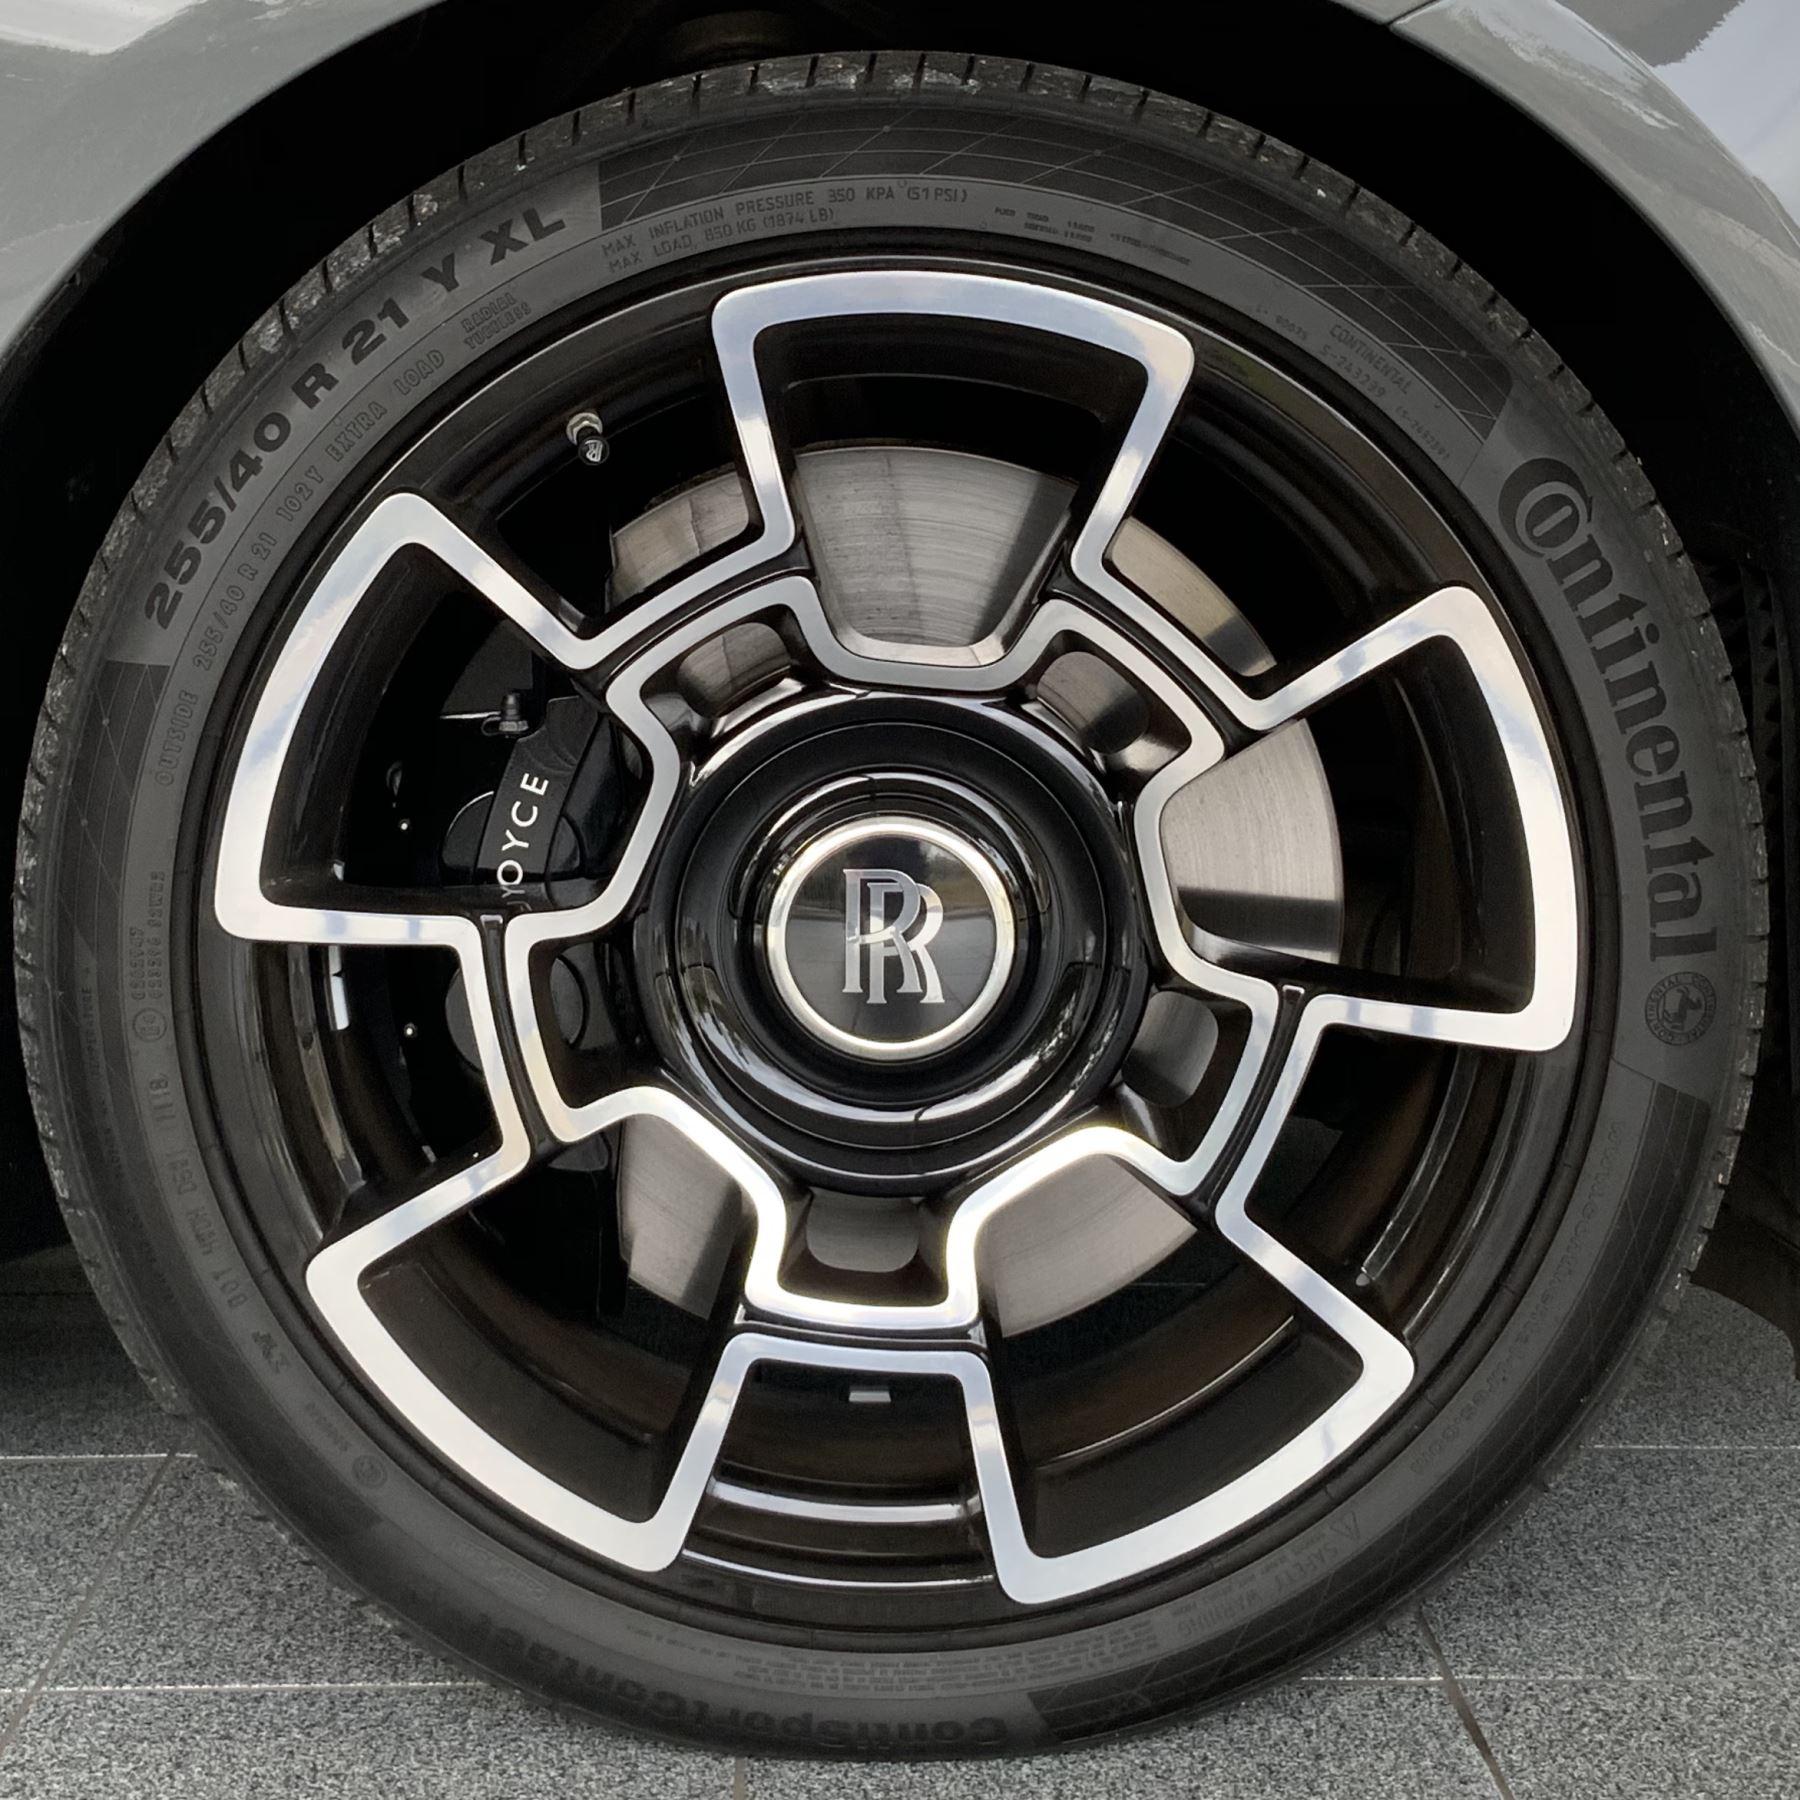 Rolls-Royce Black Badge Wraith V12 image 9